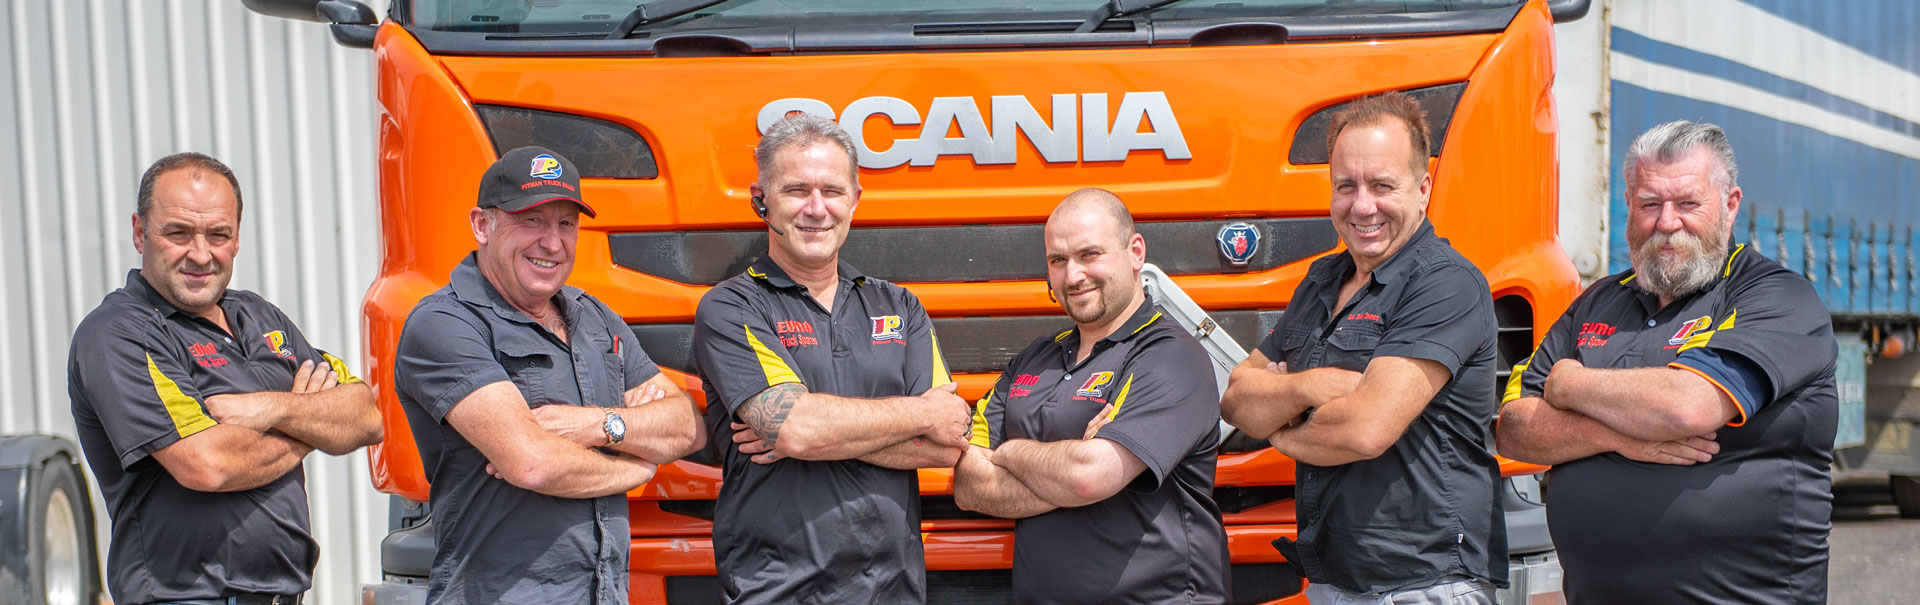 slider4 - euro trucks spares and repairs